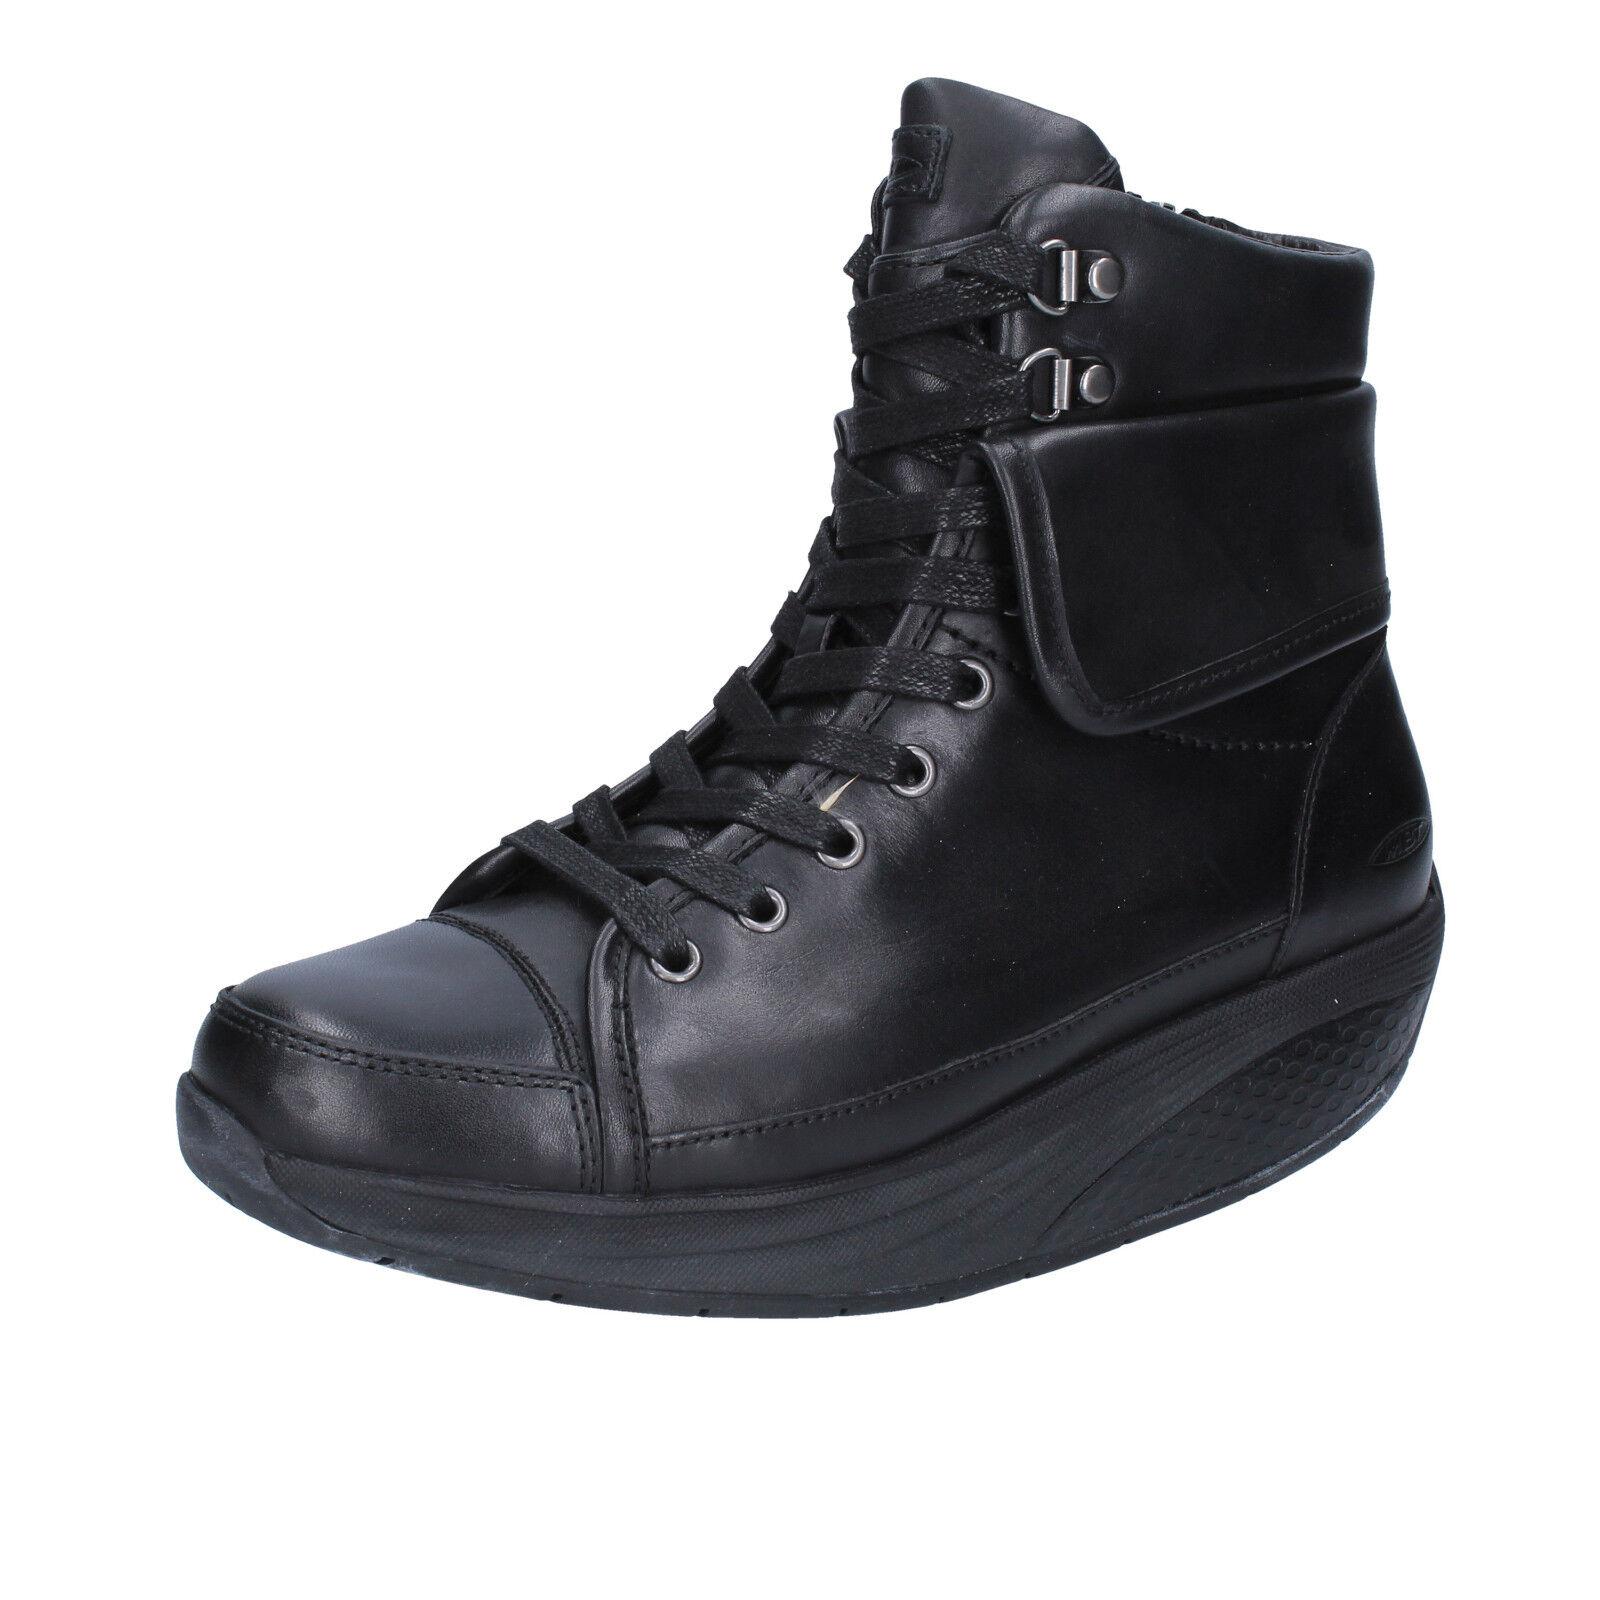 women's shoes MBT 8 / 8,5 () ankle boots black leather BT206-39